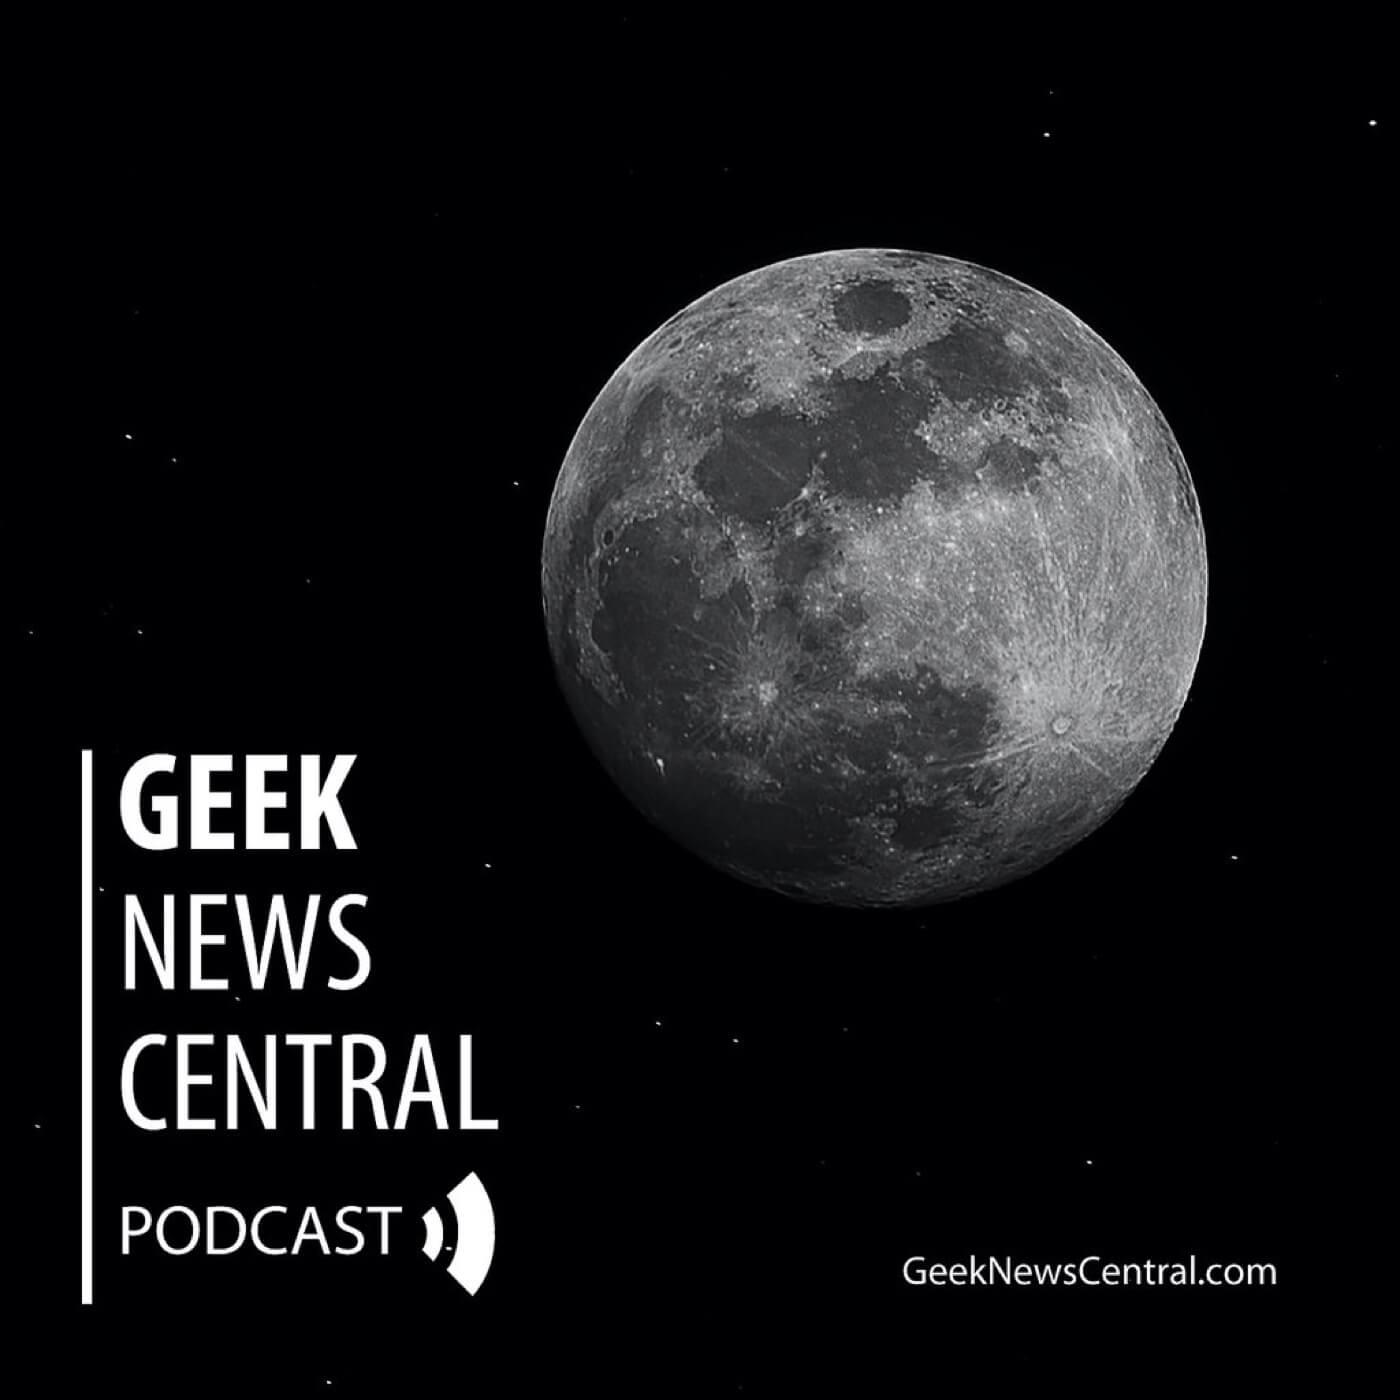 Geek News Central Podcast